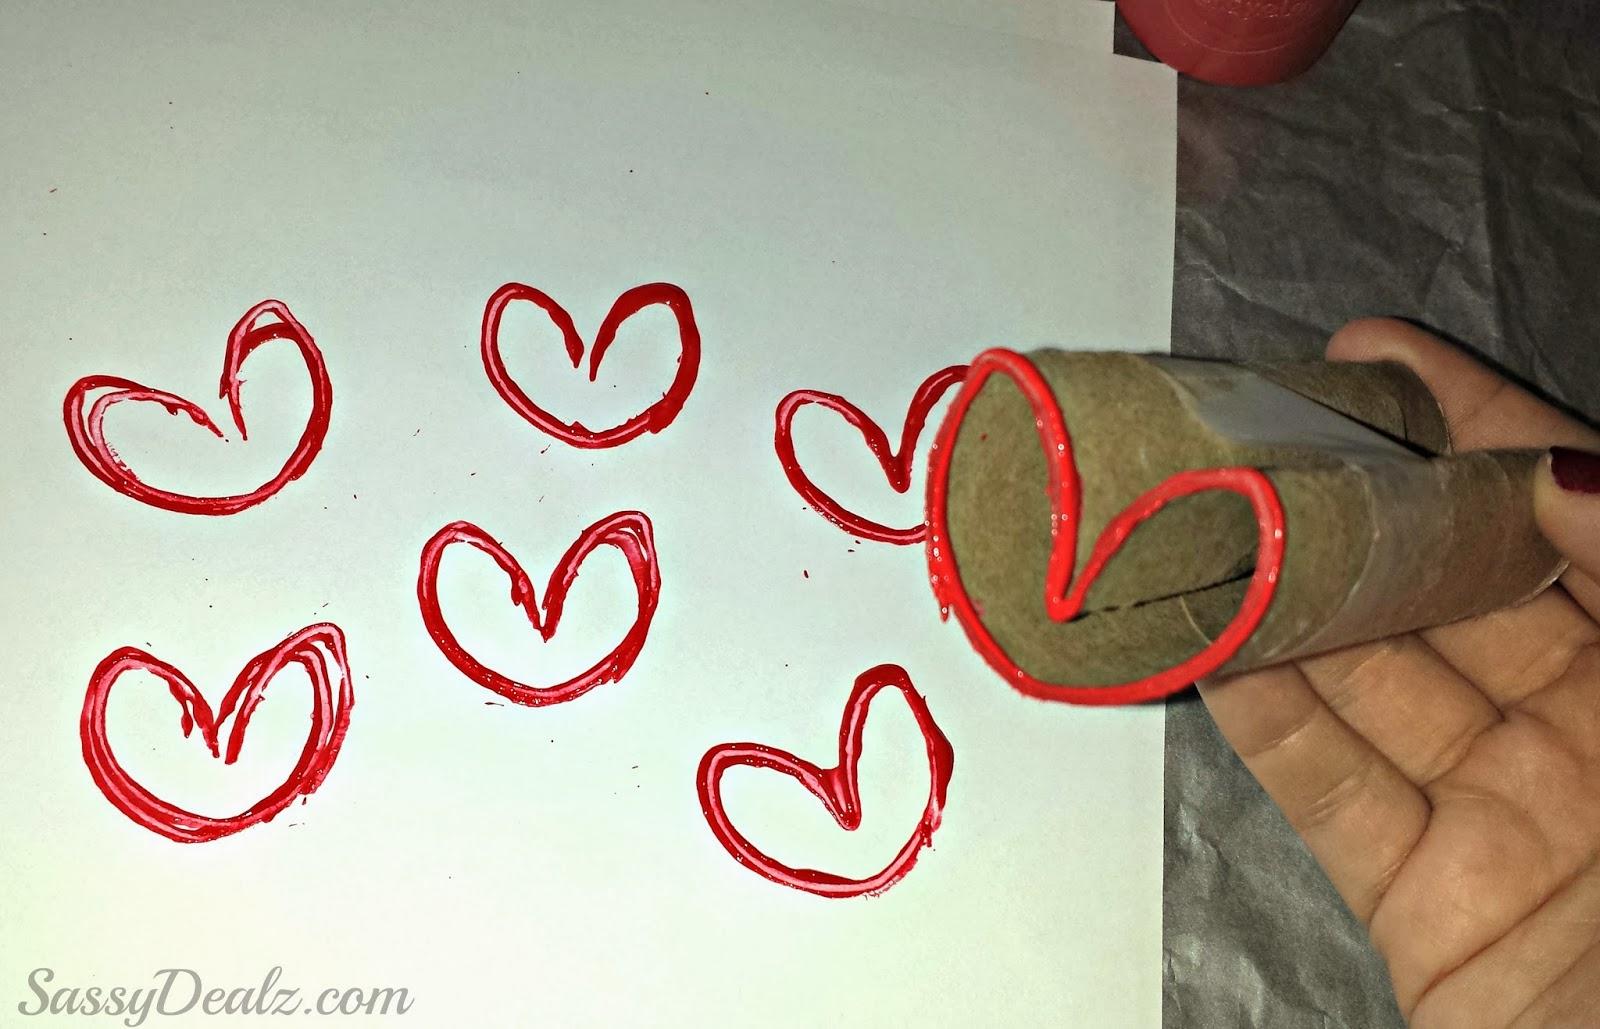 Diy heart stamp using toilet paper rolls kids valentines craft heart stamp toilet paper roll craft jeuxipadfo Gallery